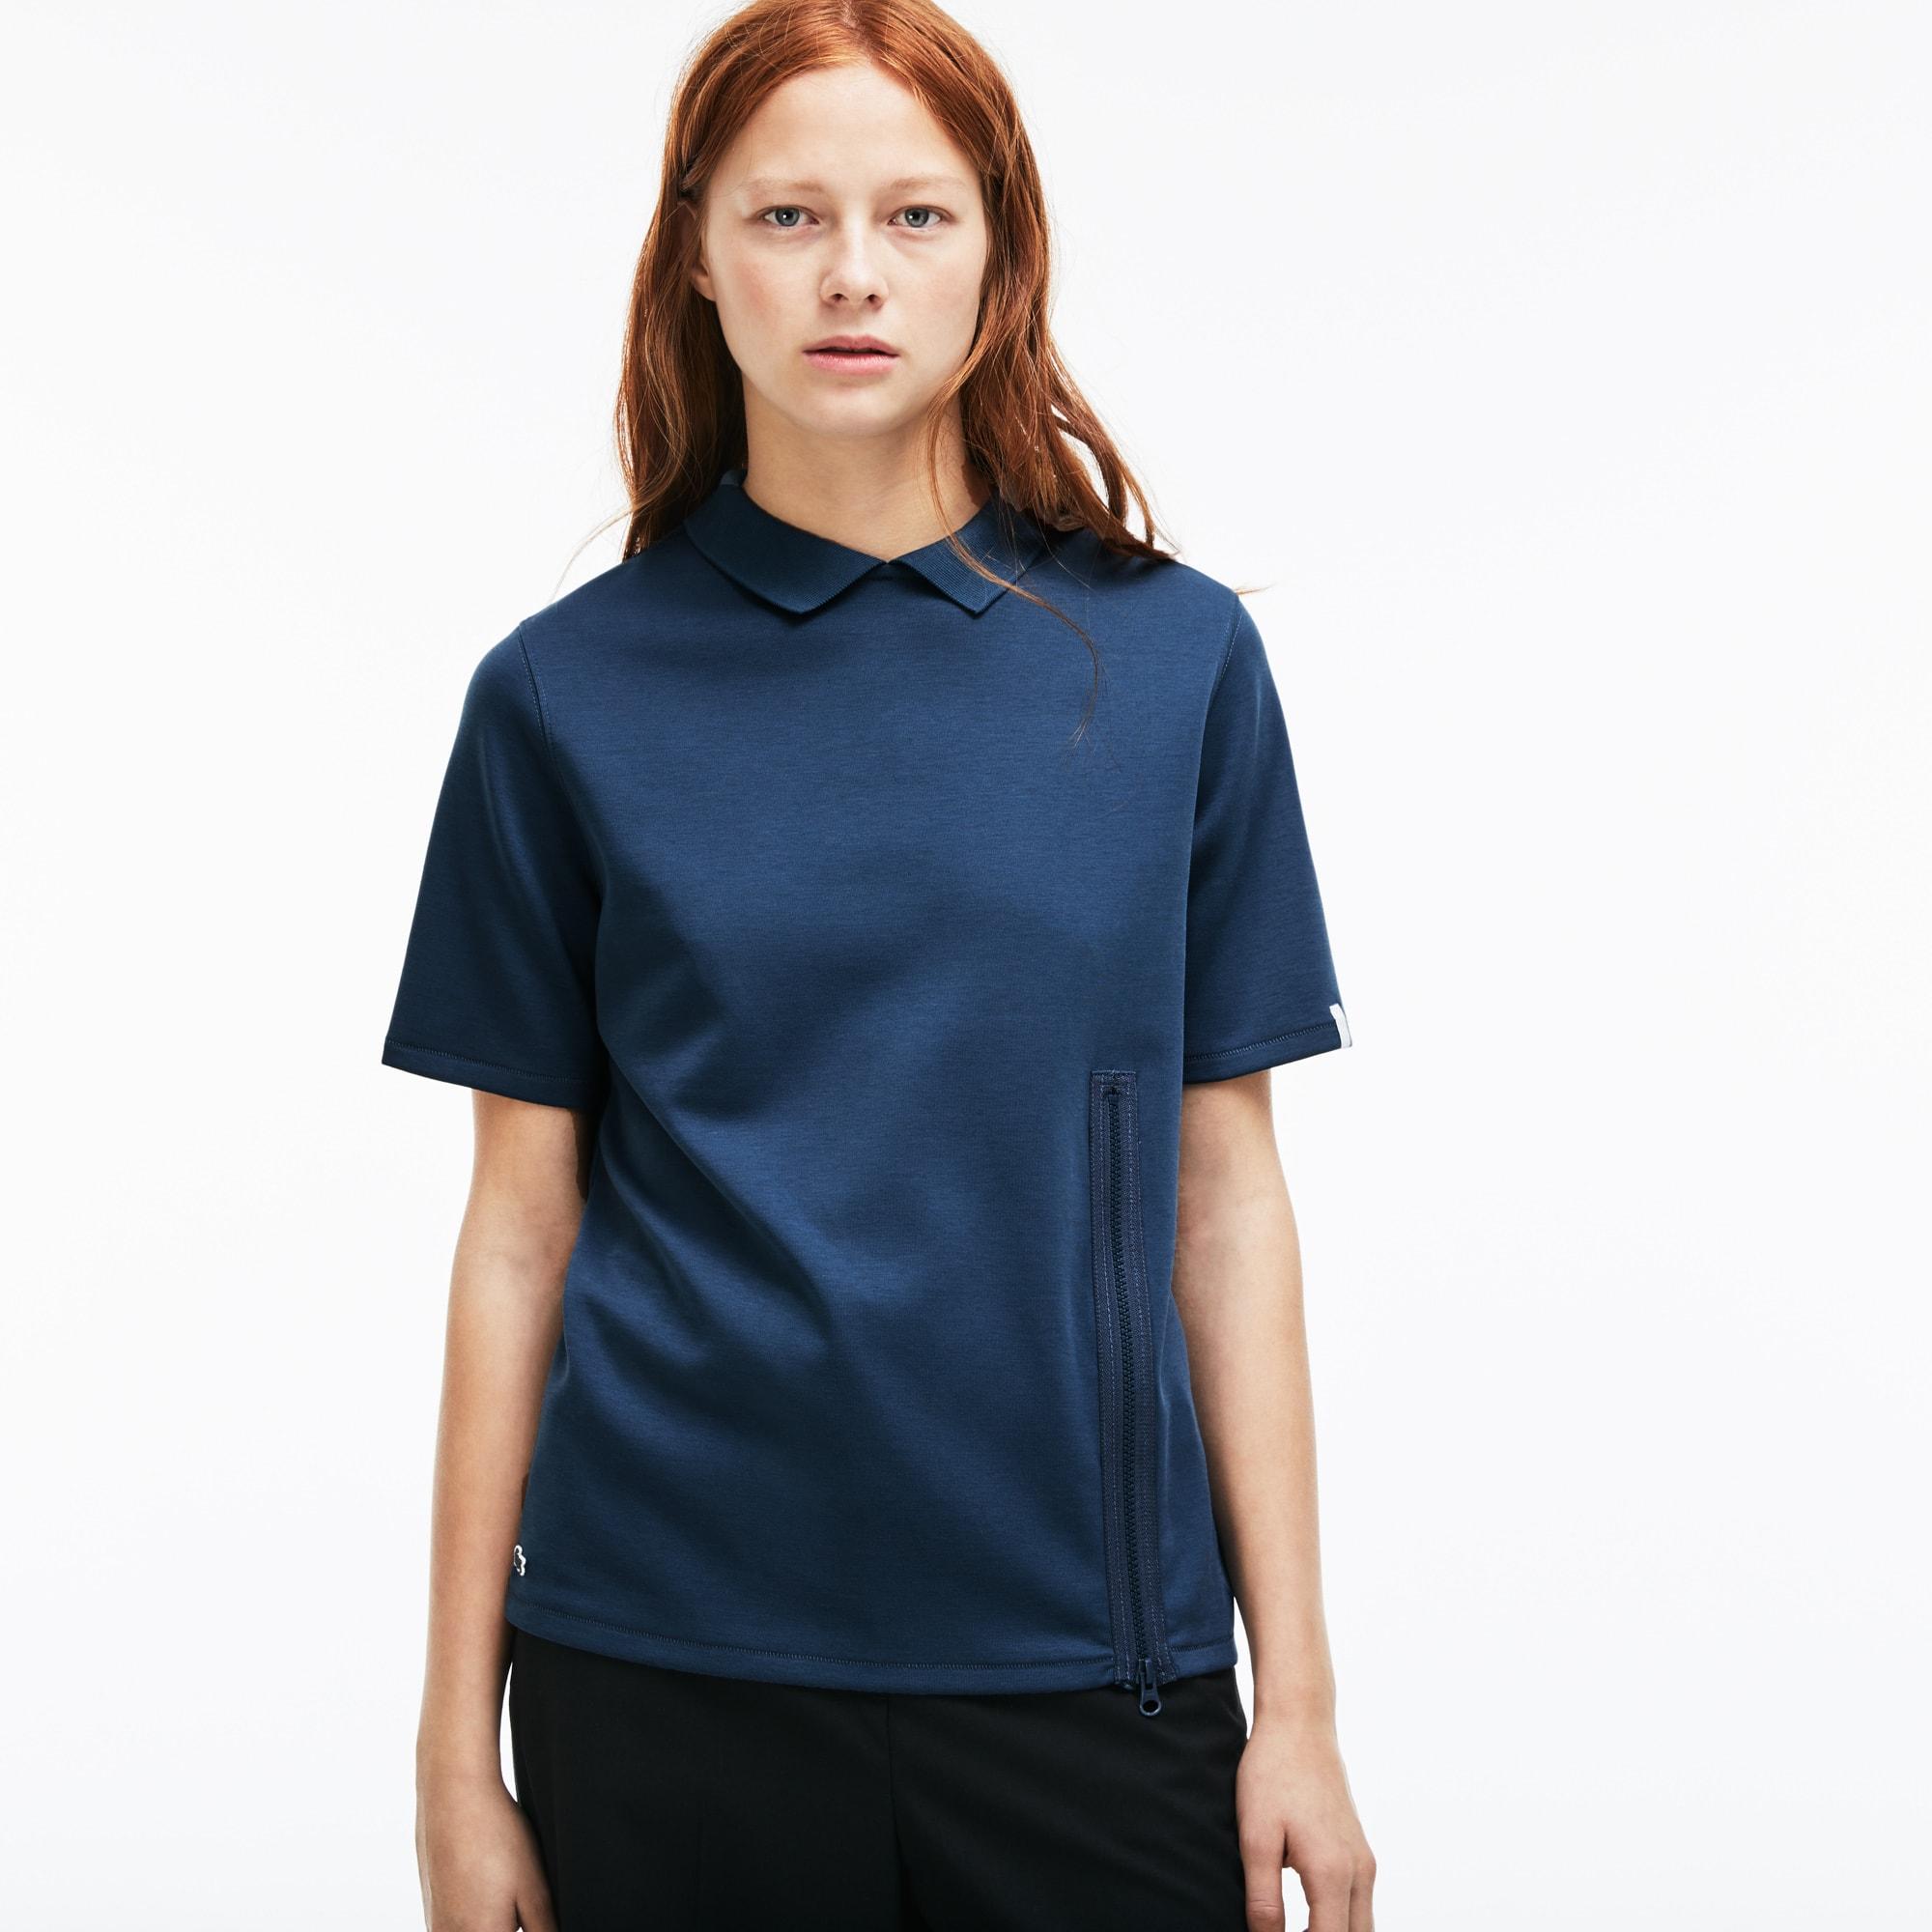 Damen-Poloshirt aus Jersey mit Reißverschluss LACOSTE L!VE